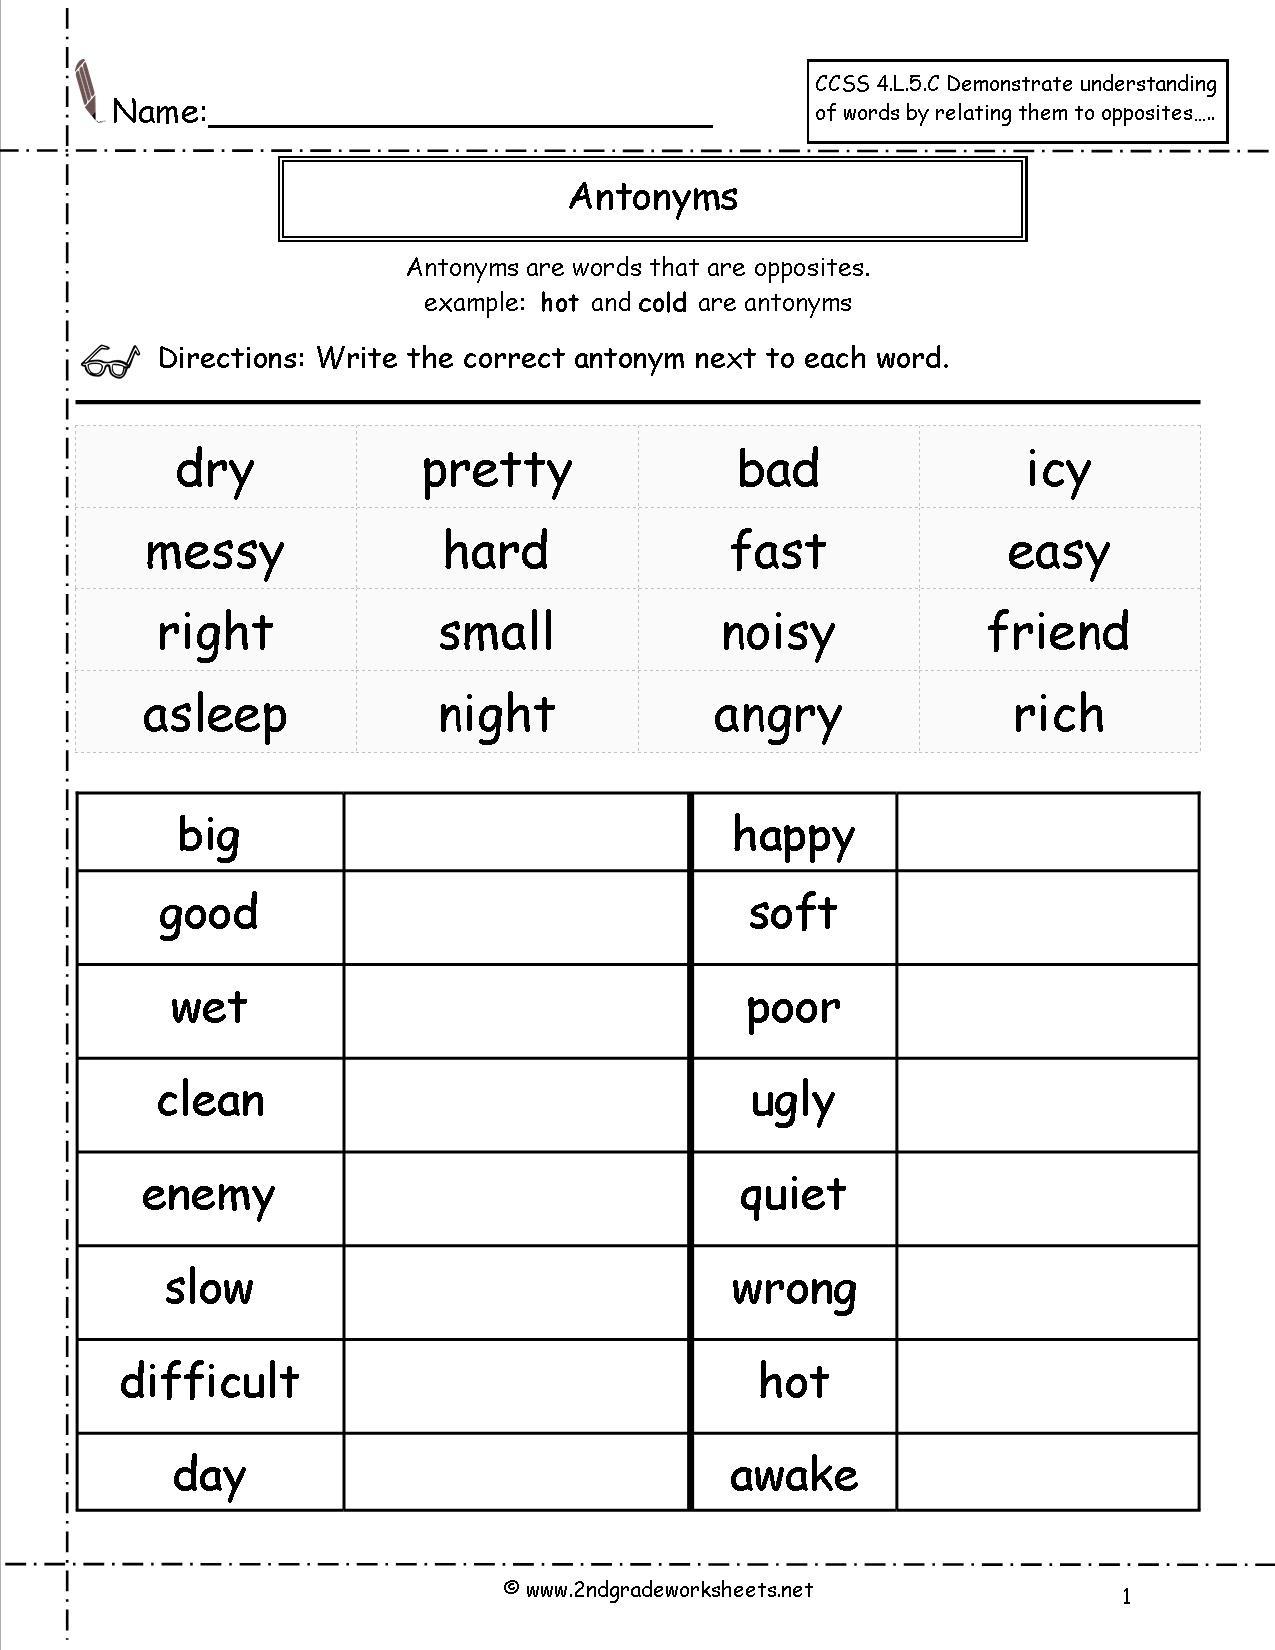 Free Language/grammar Worksheets And Printouts - Daily Language Review Grade 5 Free Printable